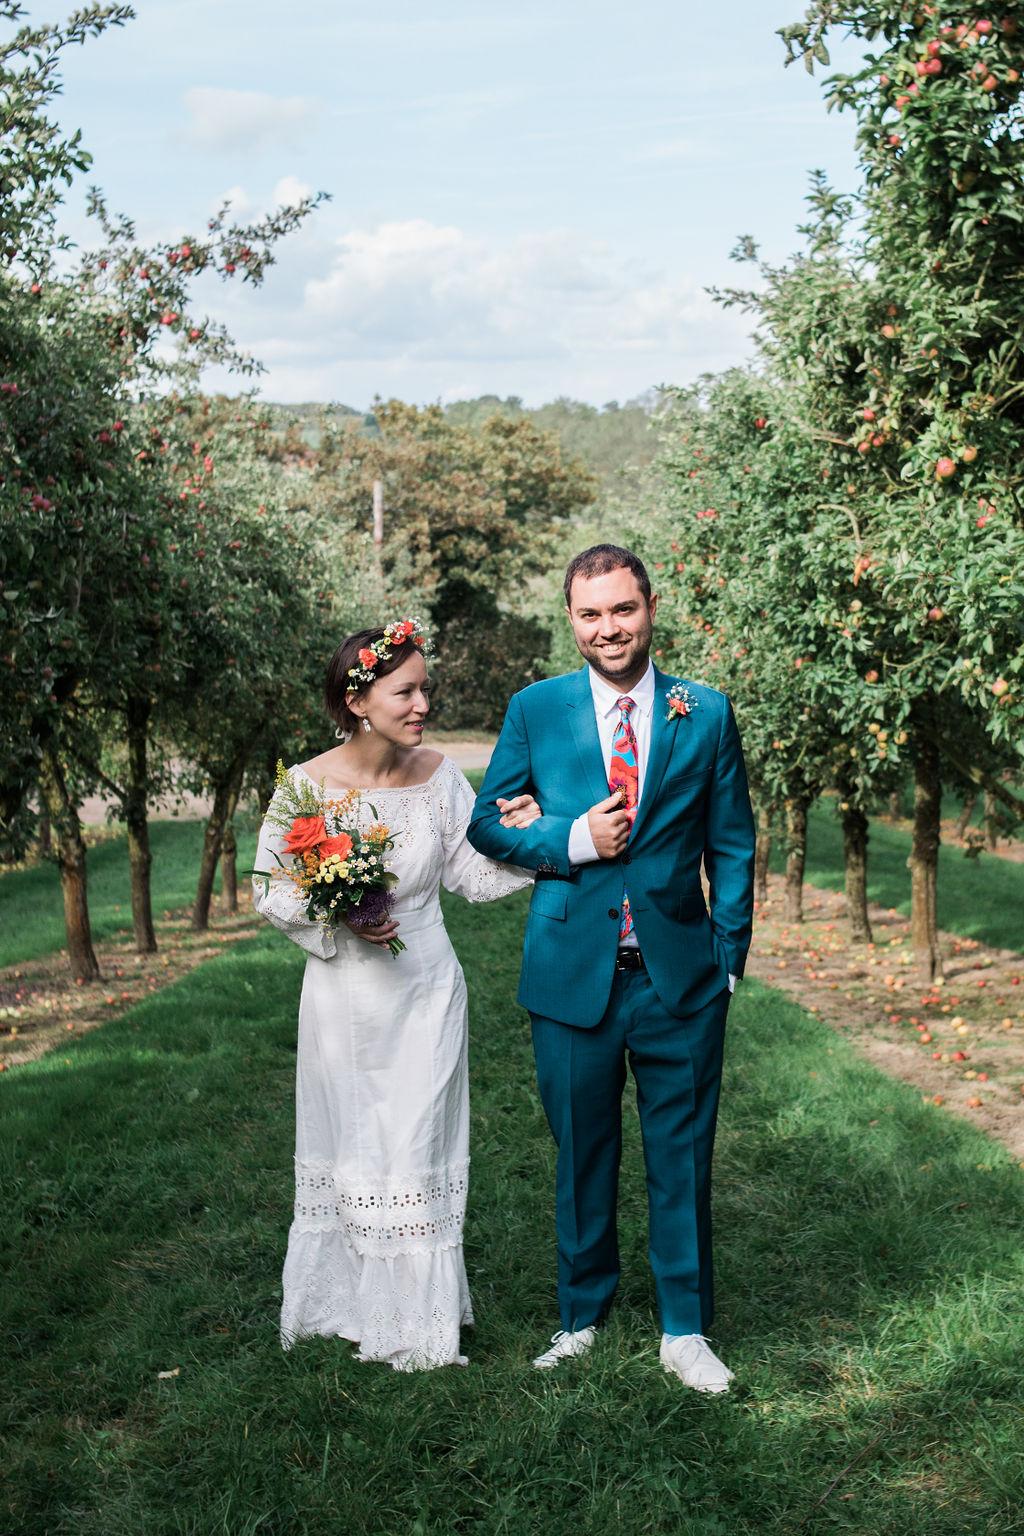 Your_Wedding_Day_Bodiam0134.jpg